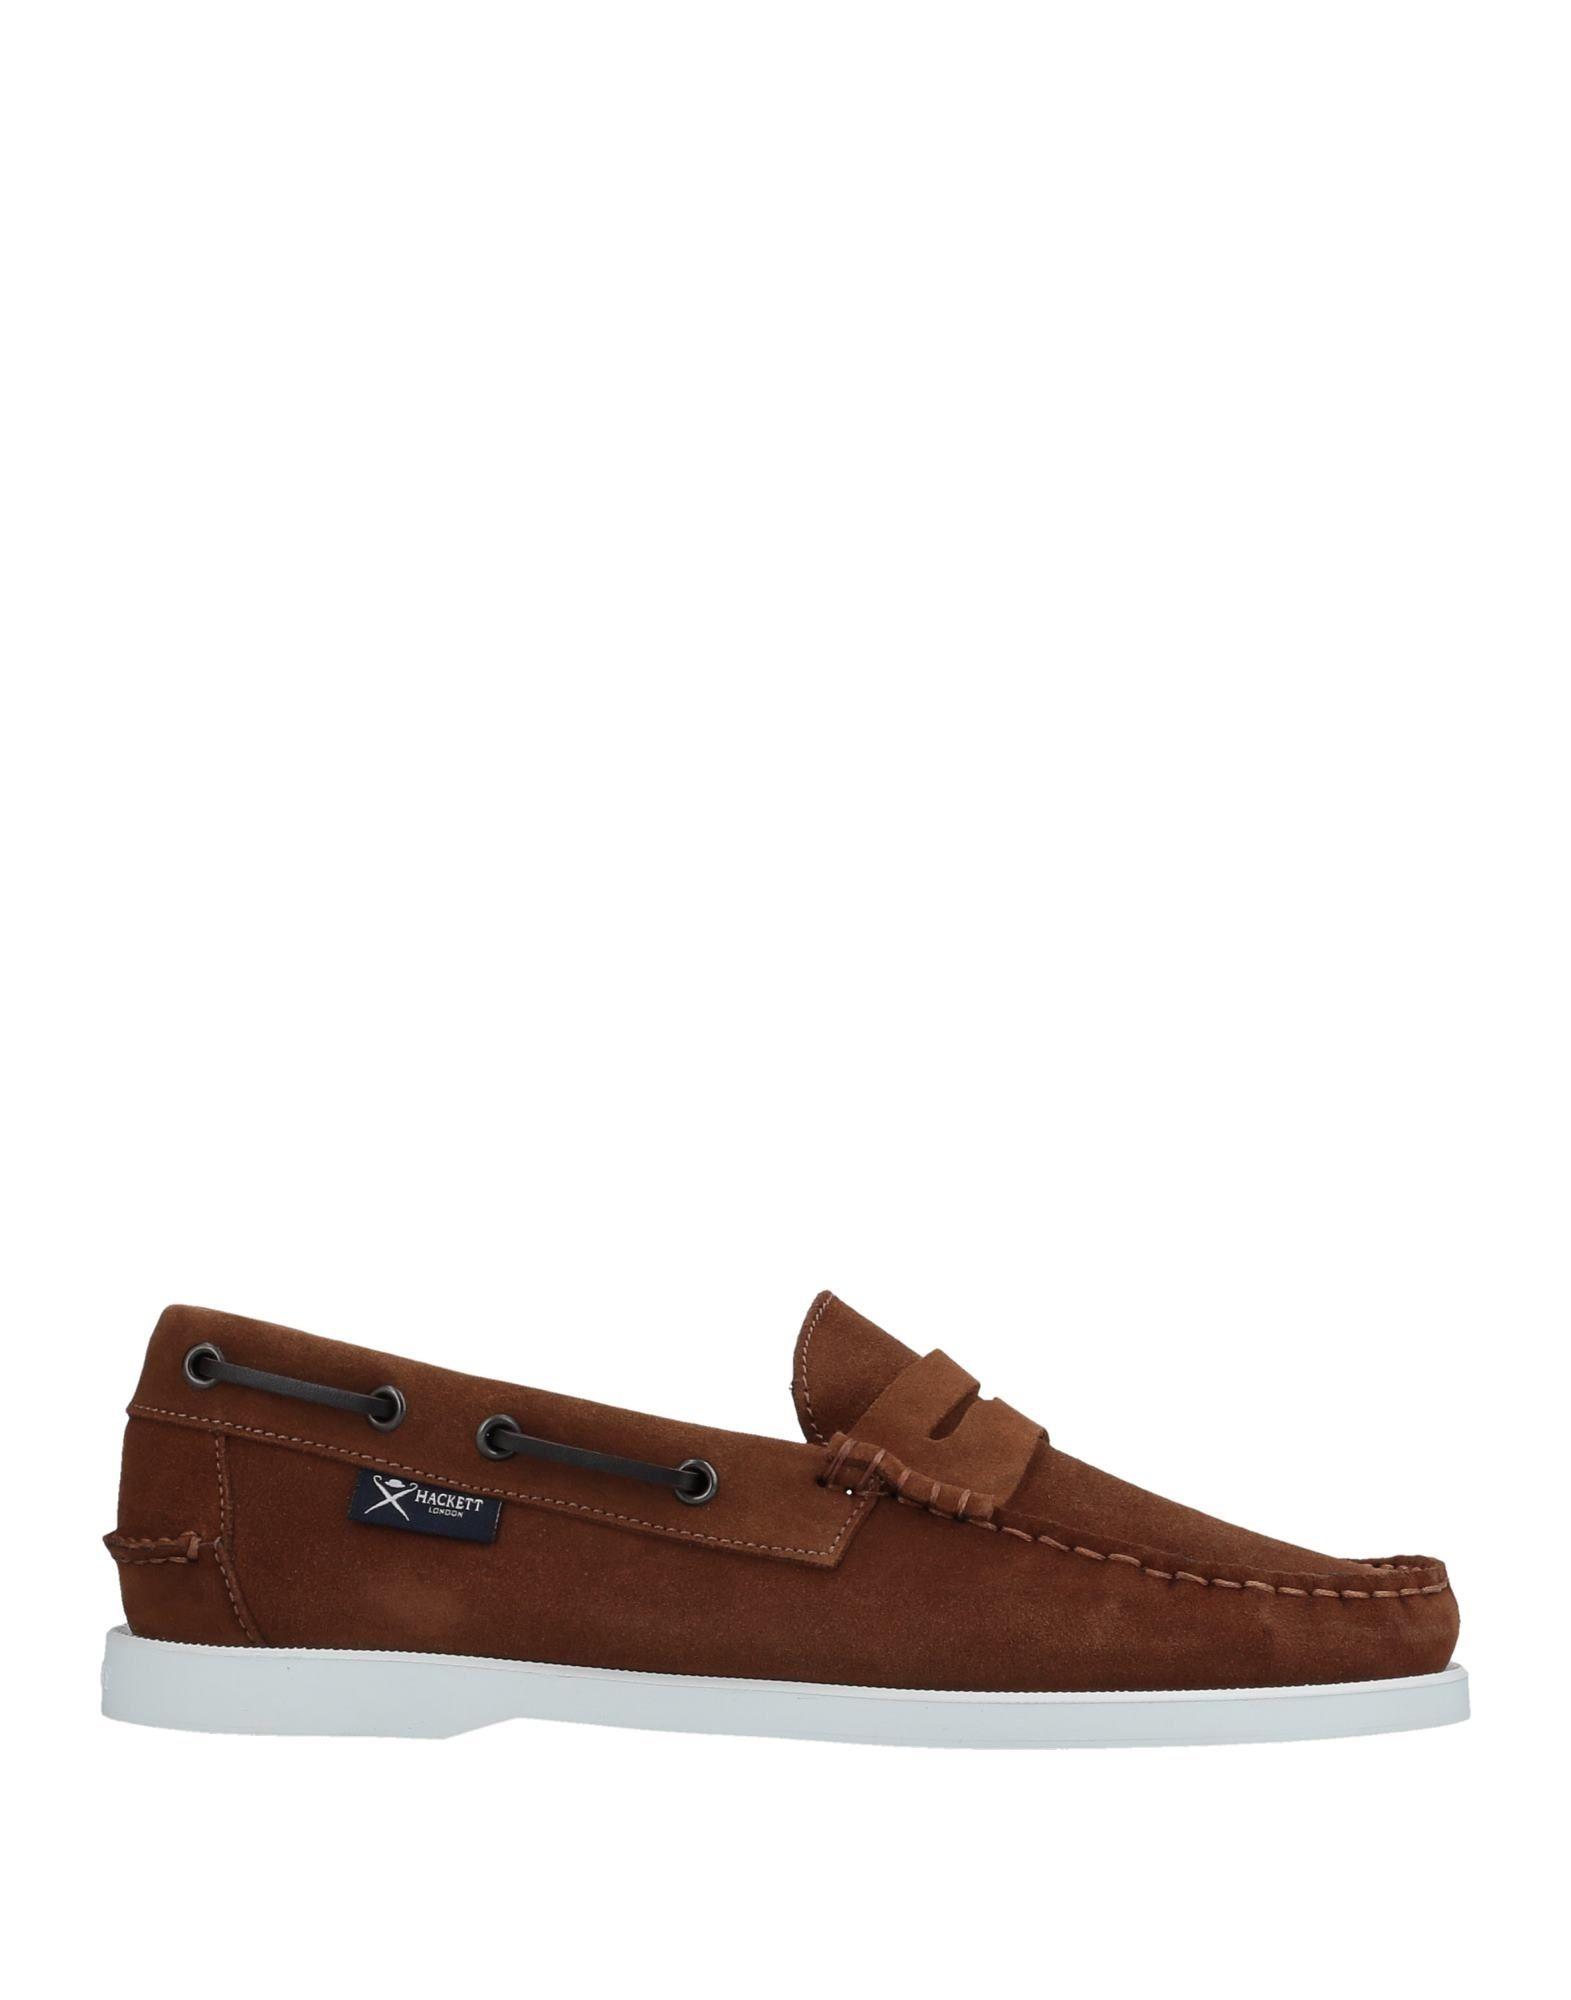 Rabatt echte Schuhe Hackett Mokassins  Herren  Mokassins 11509337ET 7f47fe